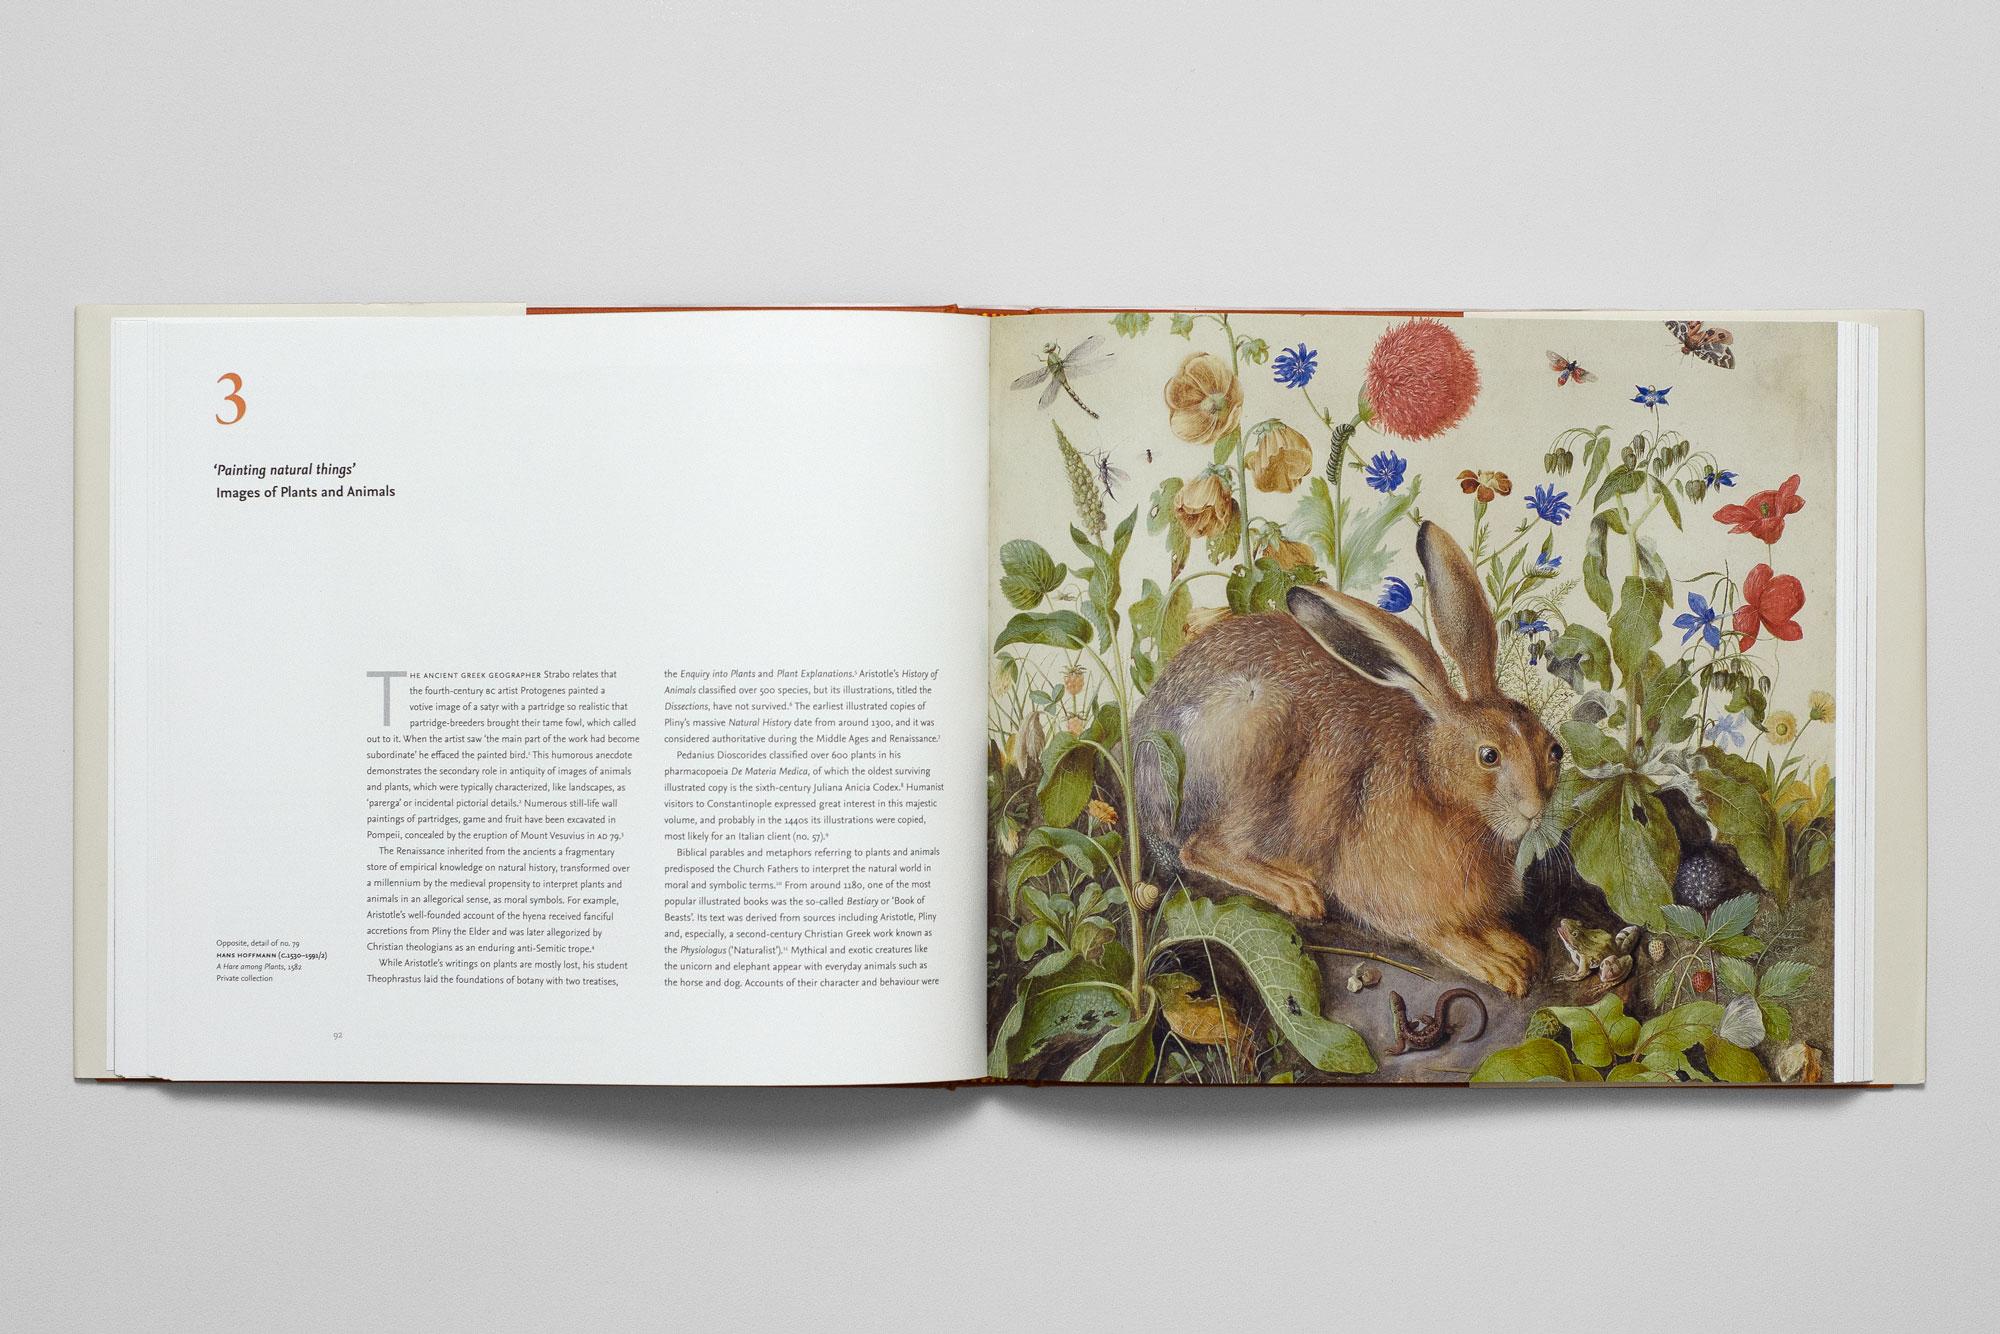 Renaissance Watercolours: From Durer to Van Dyke